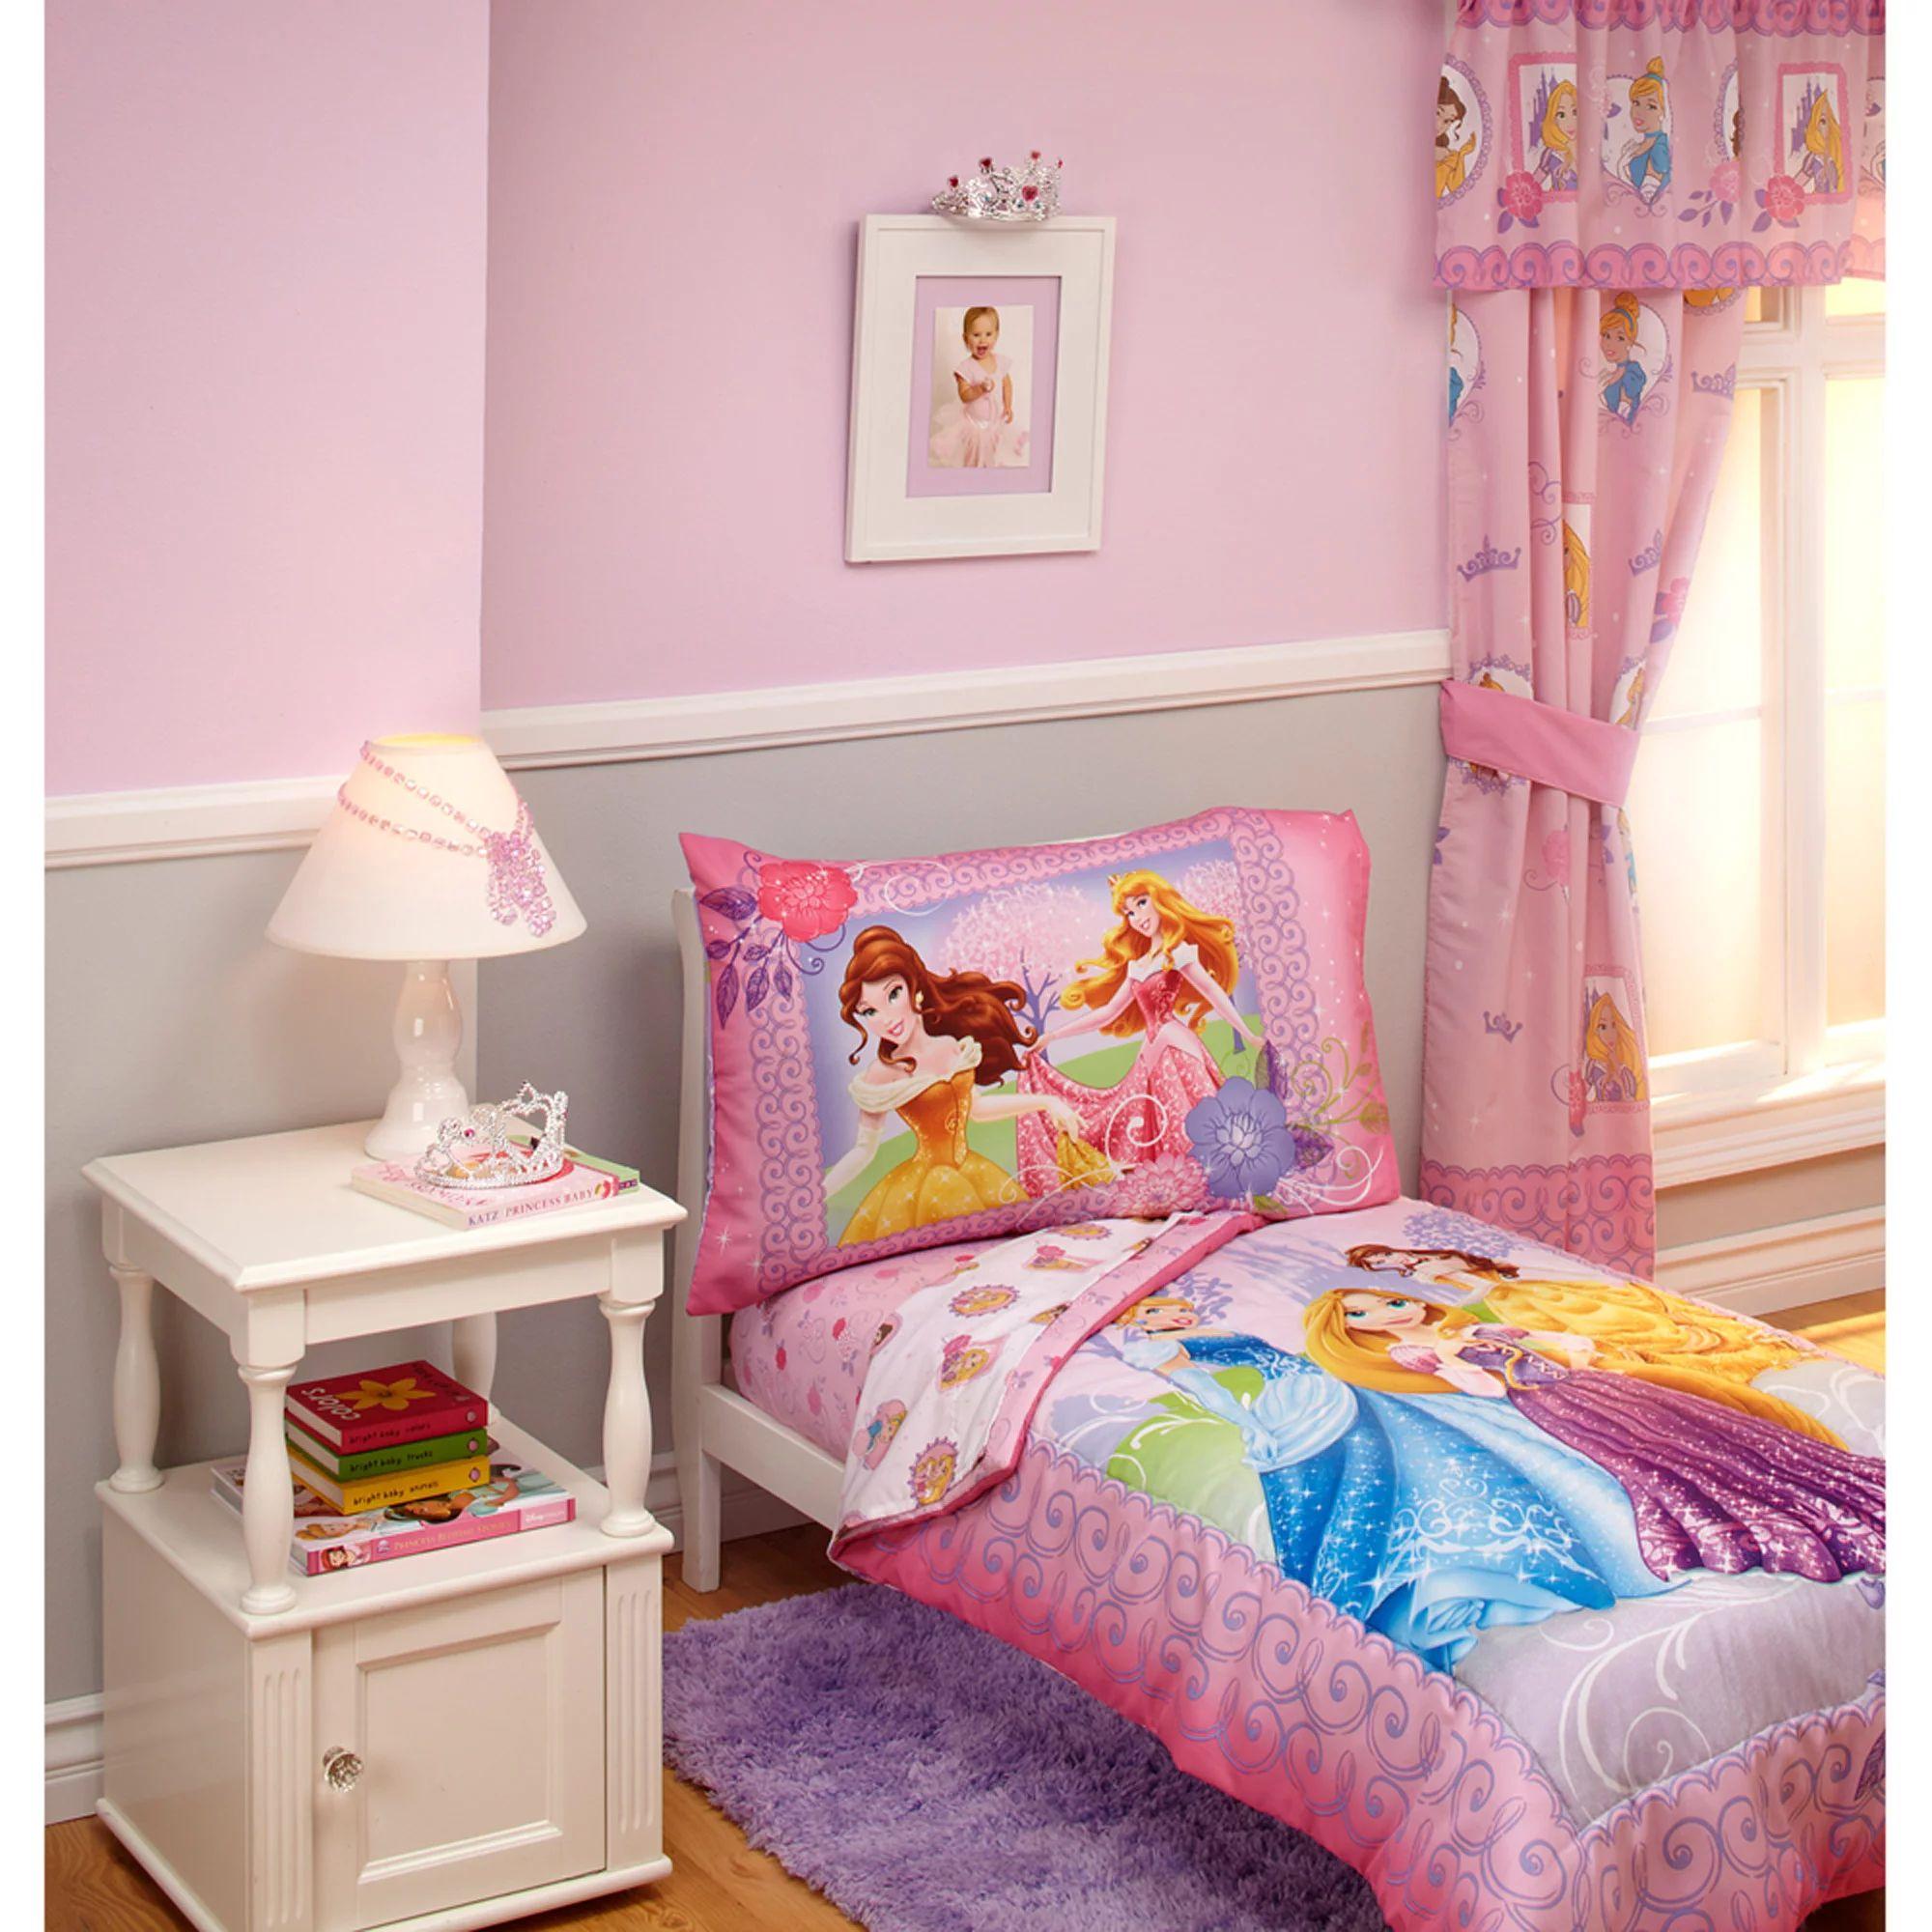 Disney princess timeless elegance 4piece toddler bedding set walmart com